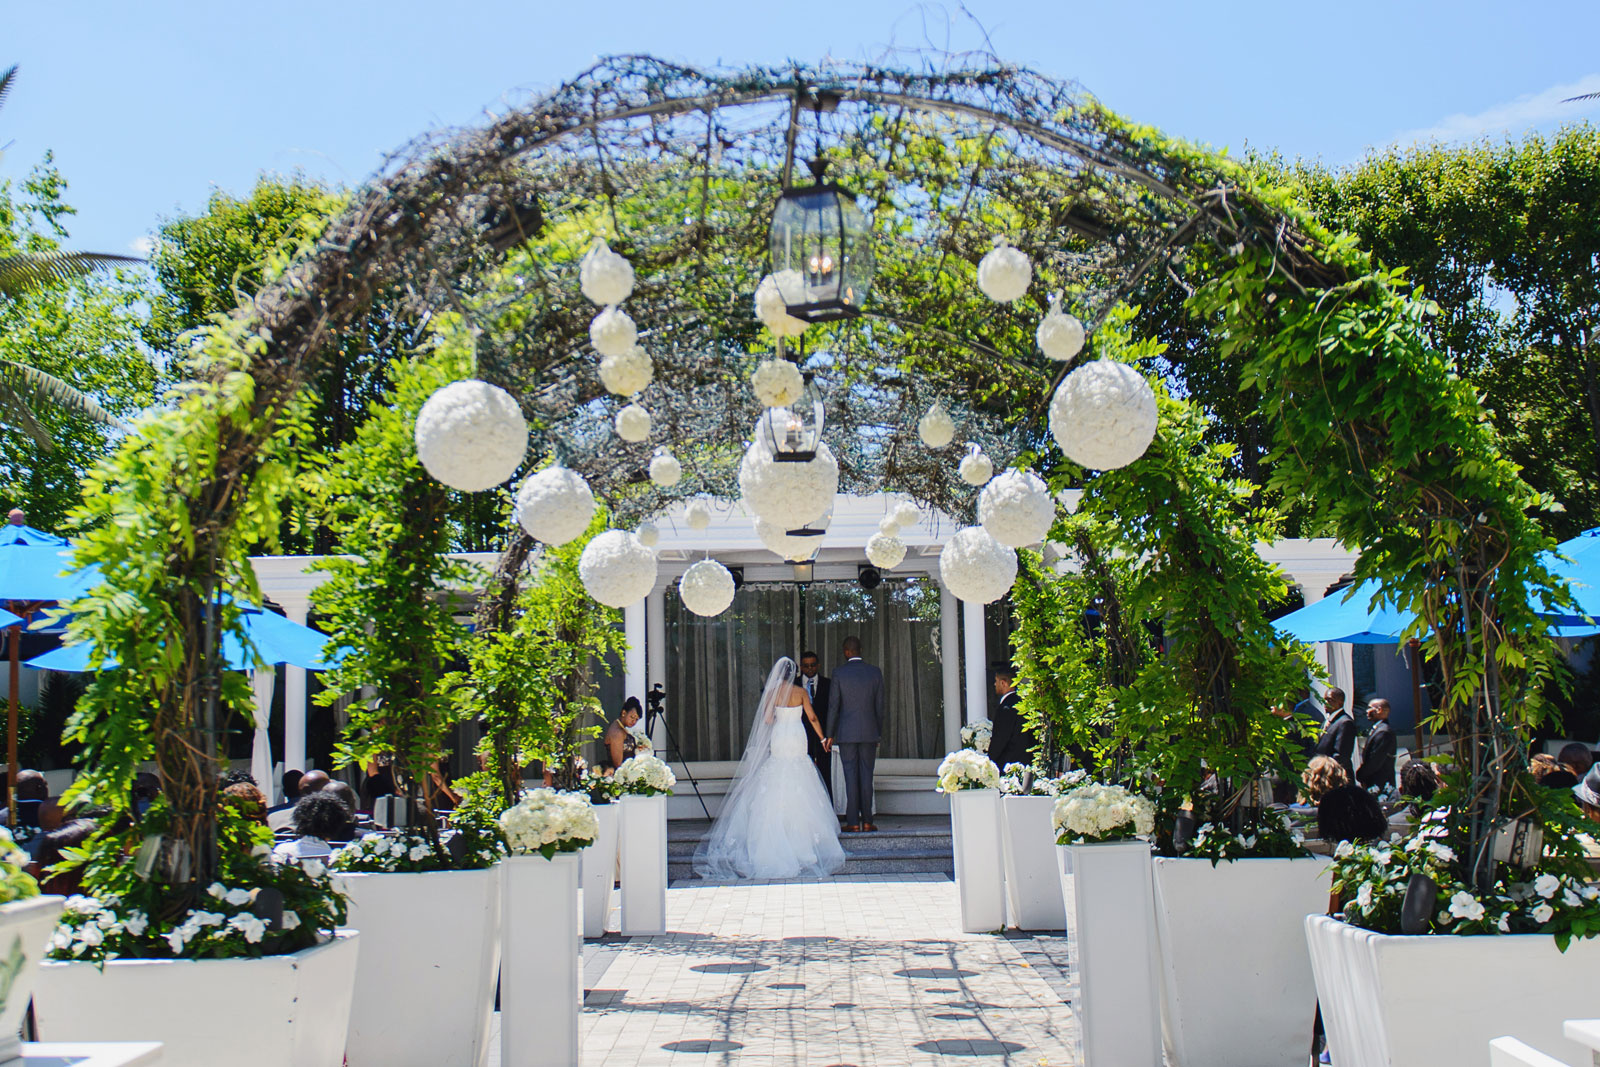 Chateau Briand Outdoor Garden Wedding